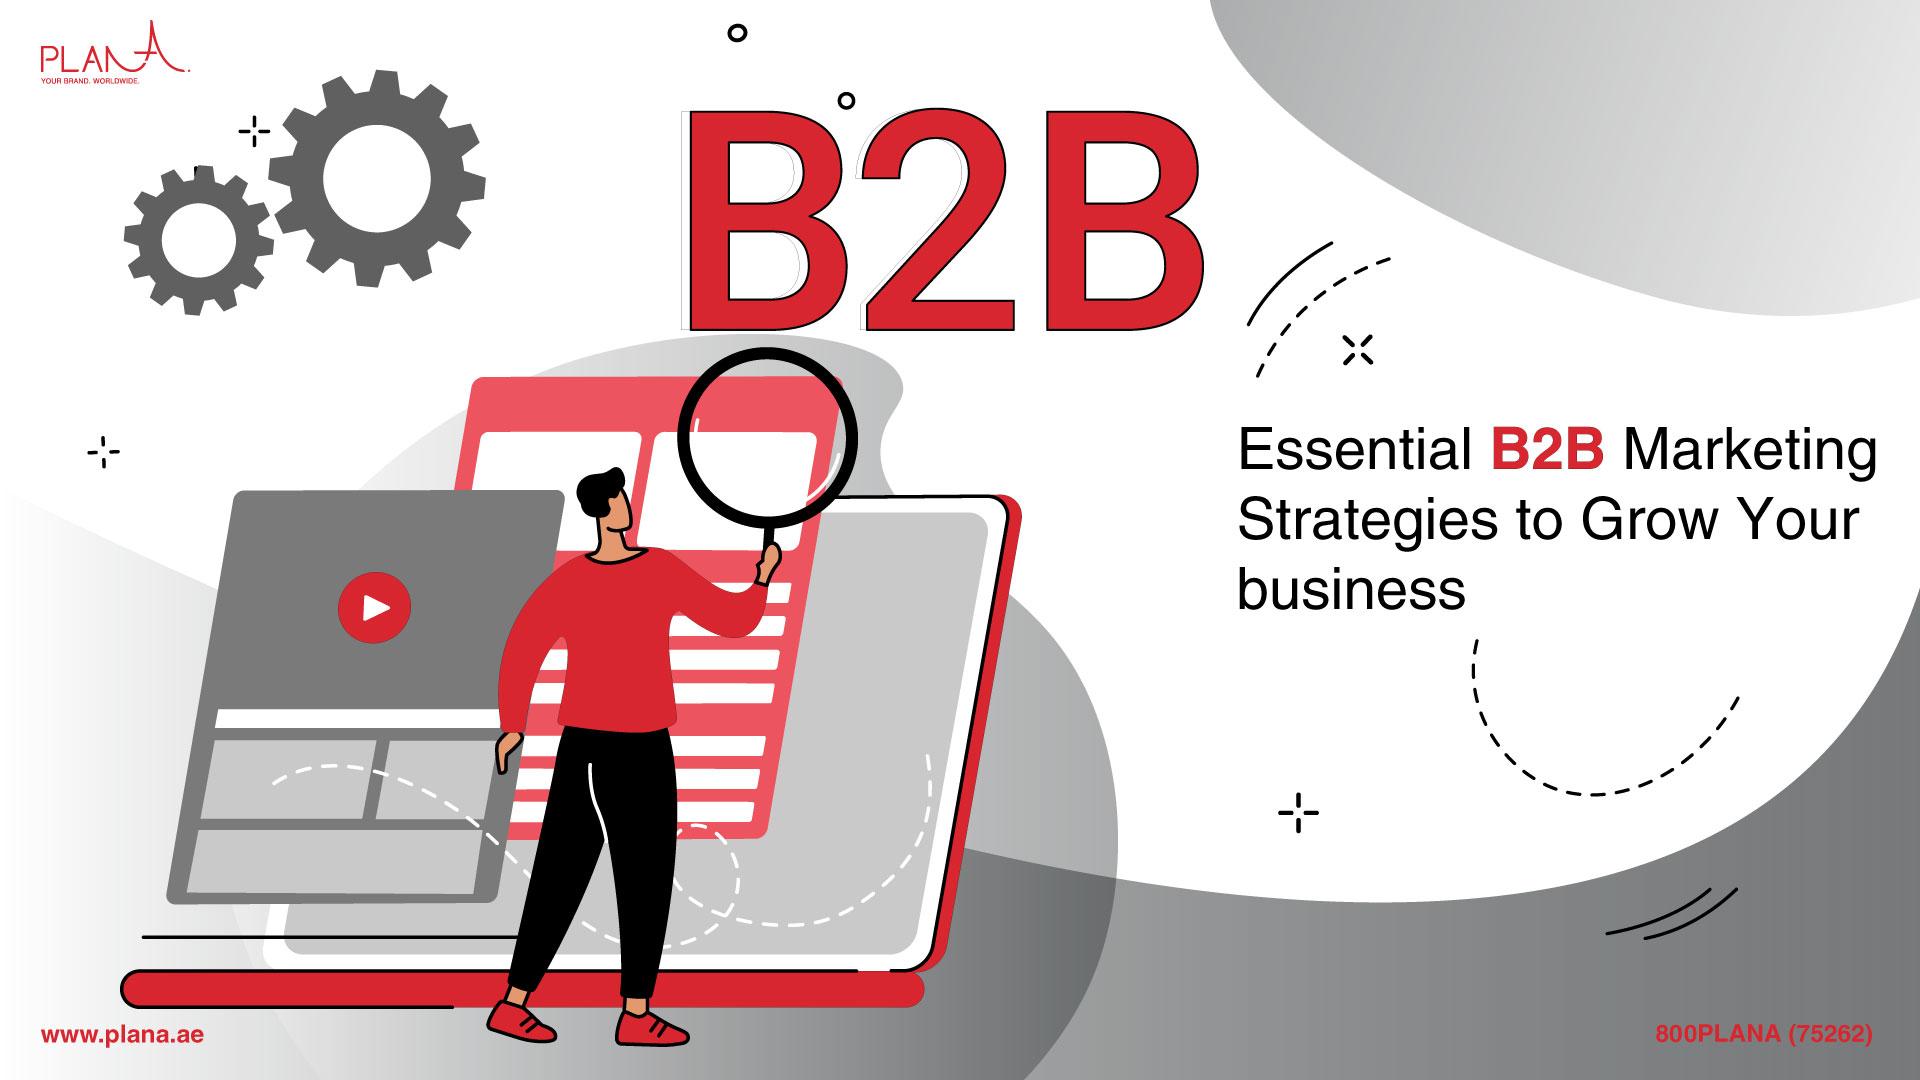 Essential B2B Marketing Strategies to Grow Your business